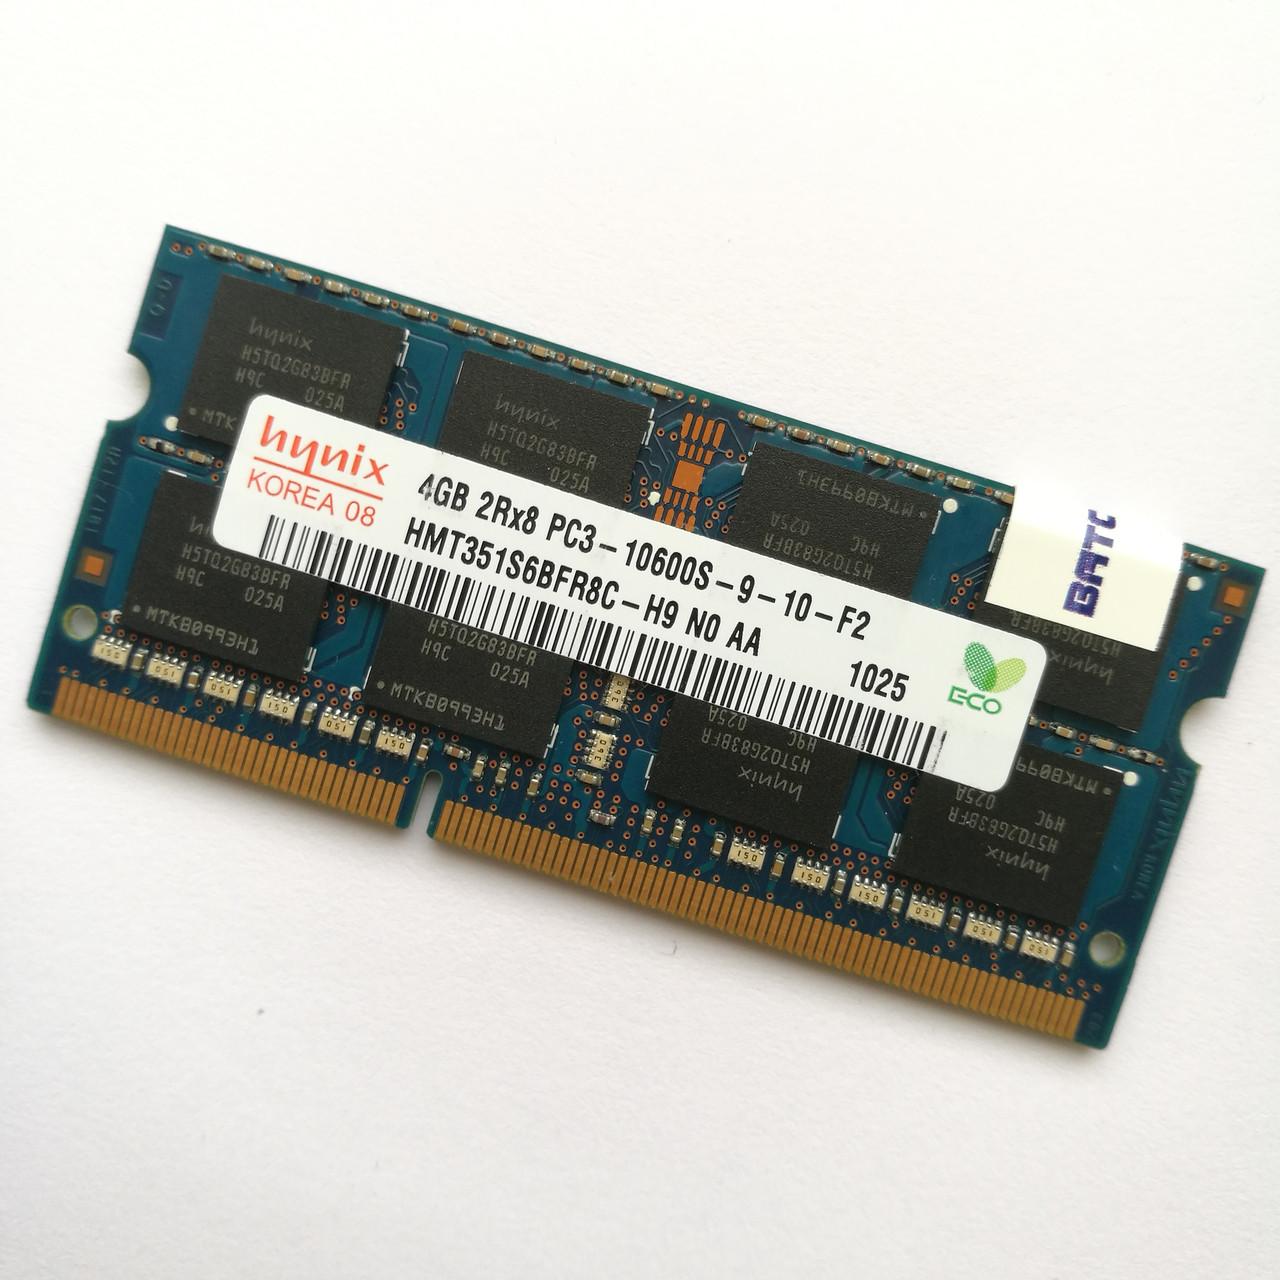 Оперативная память для ноутбука Hynix SODIMM DDR3 4 Gb 1333 MHz 10600s 2R8 CL9 (HMT351S6BFR8C-H9 N0 AA) Б/У